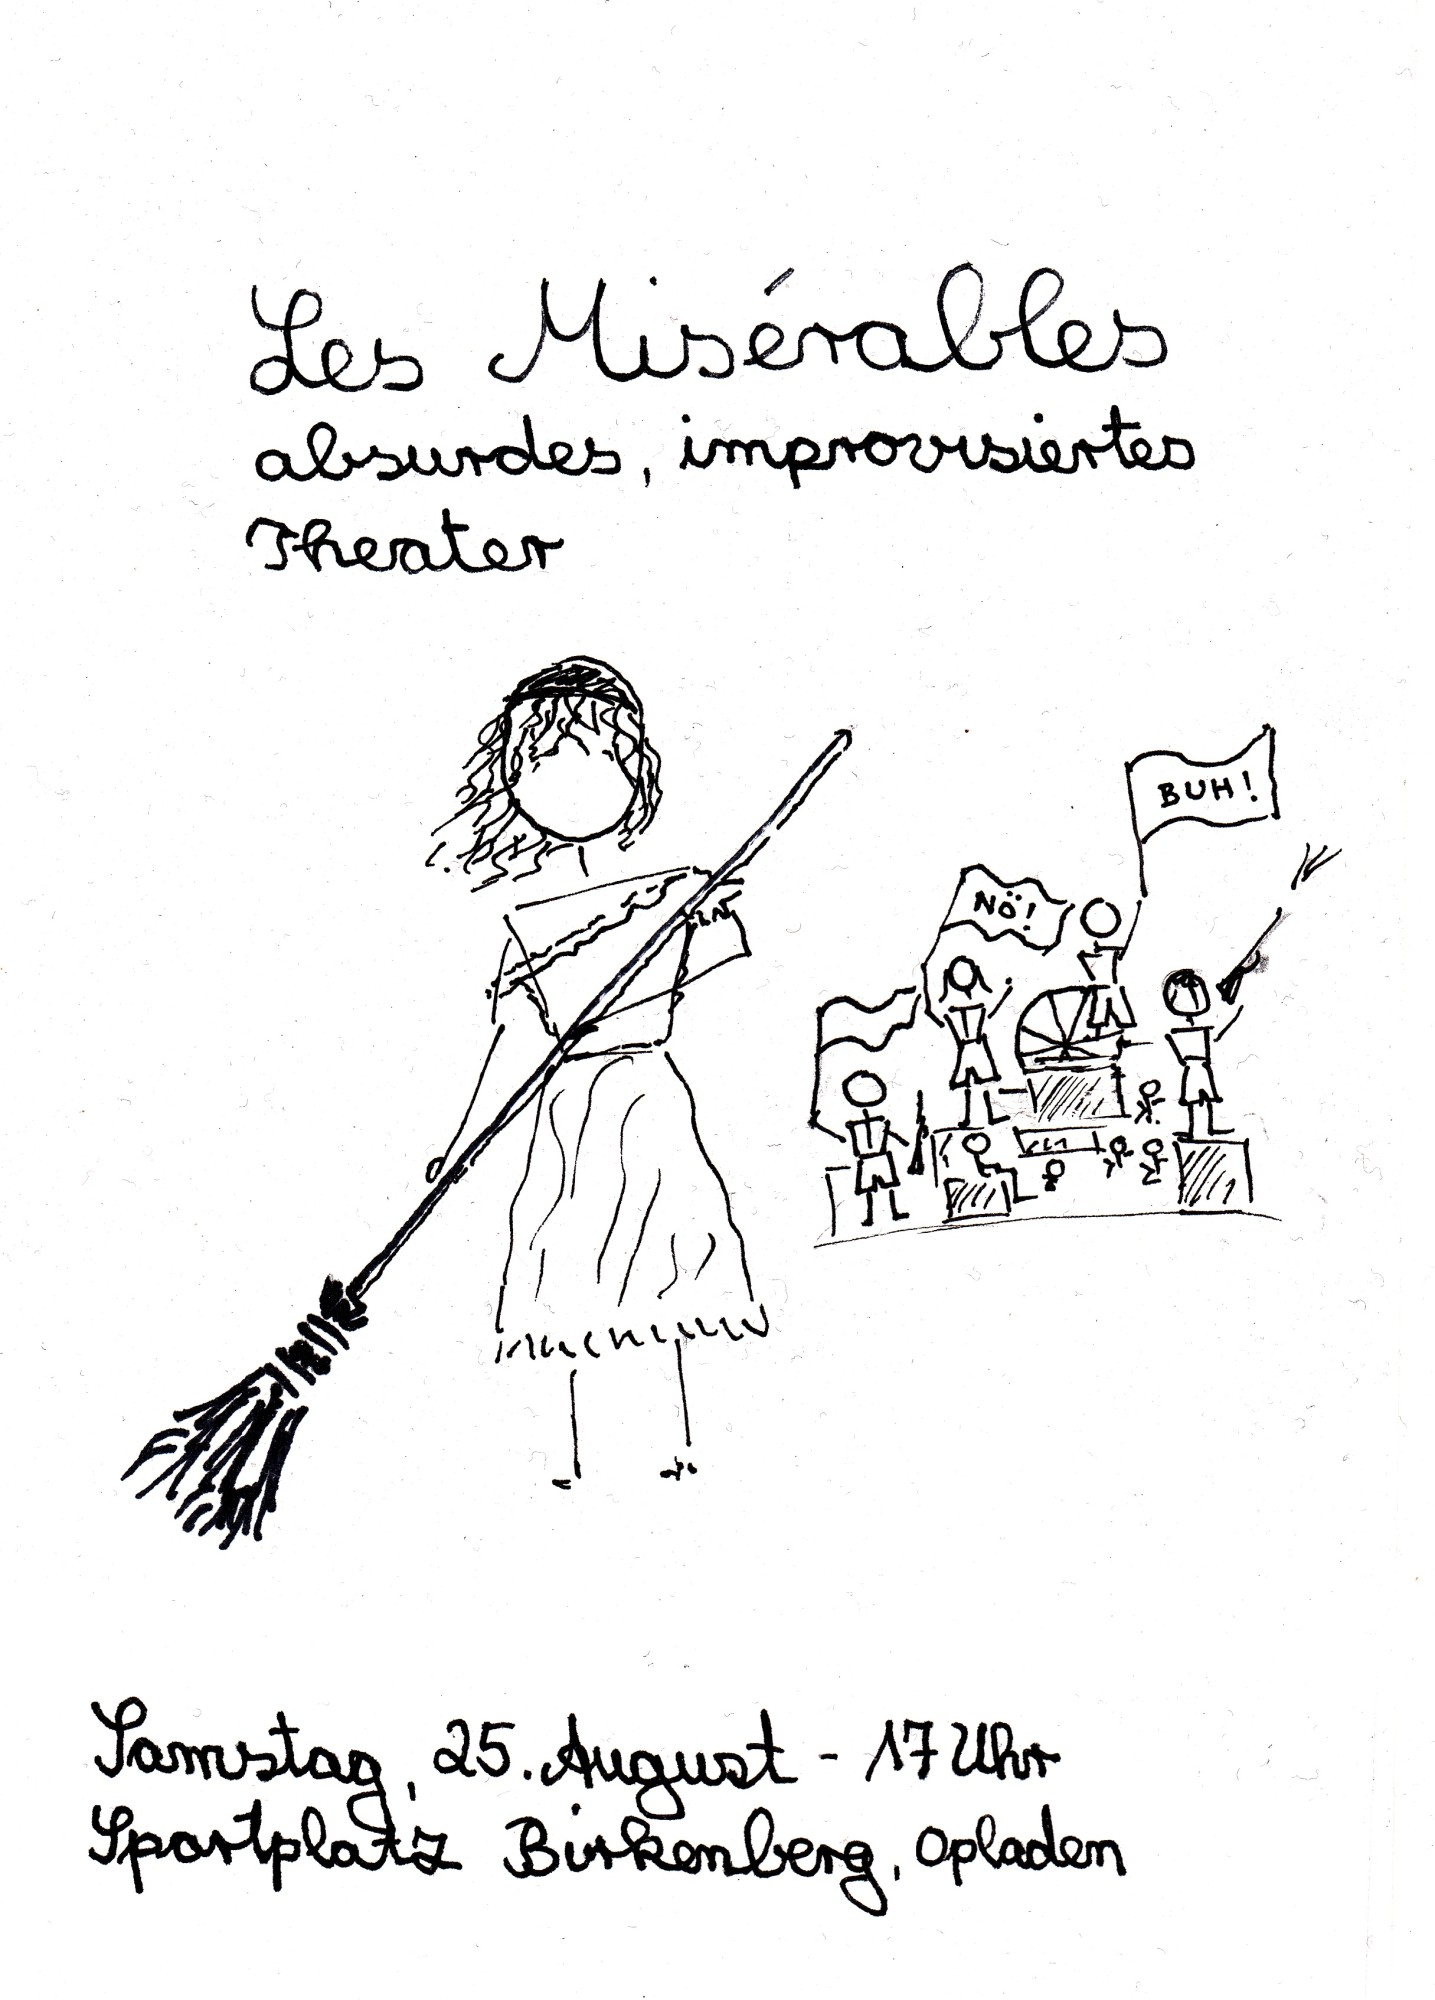 Les Mis Flyer Birkenberg